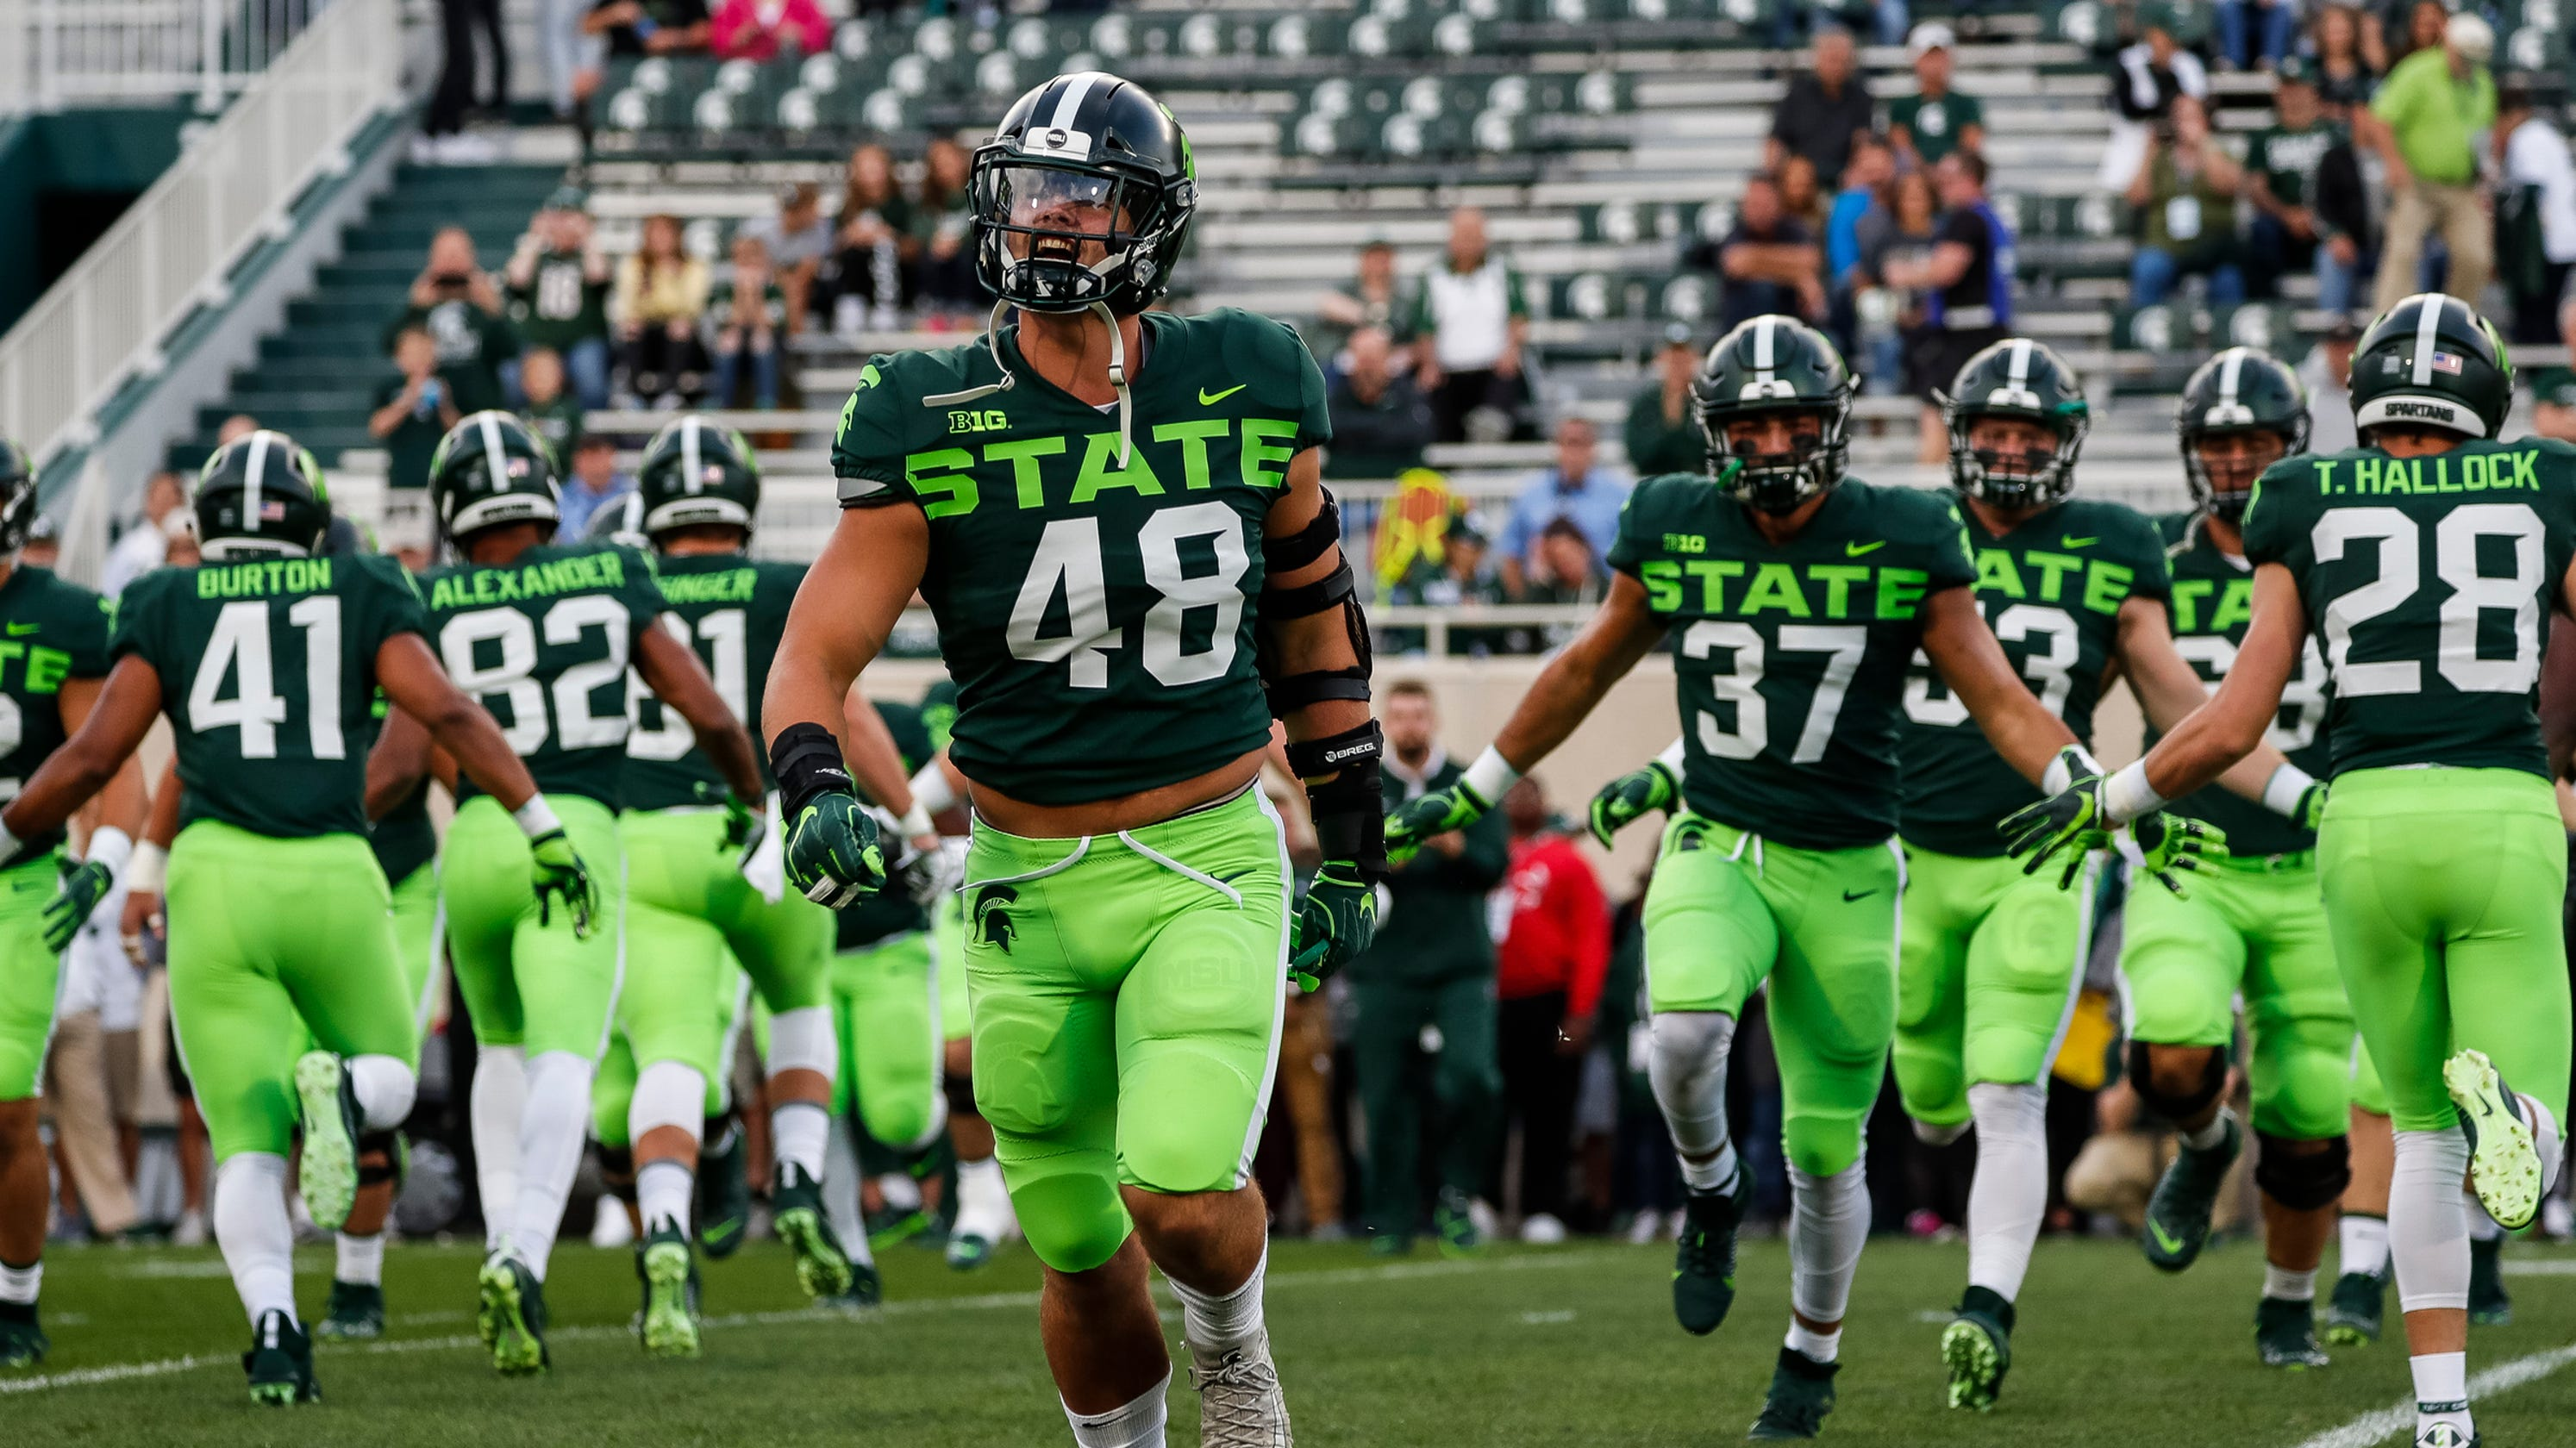 michigan football state uniforms neon social college spartans sports uniform green